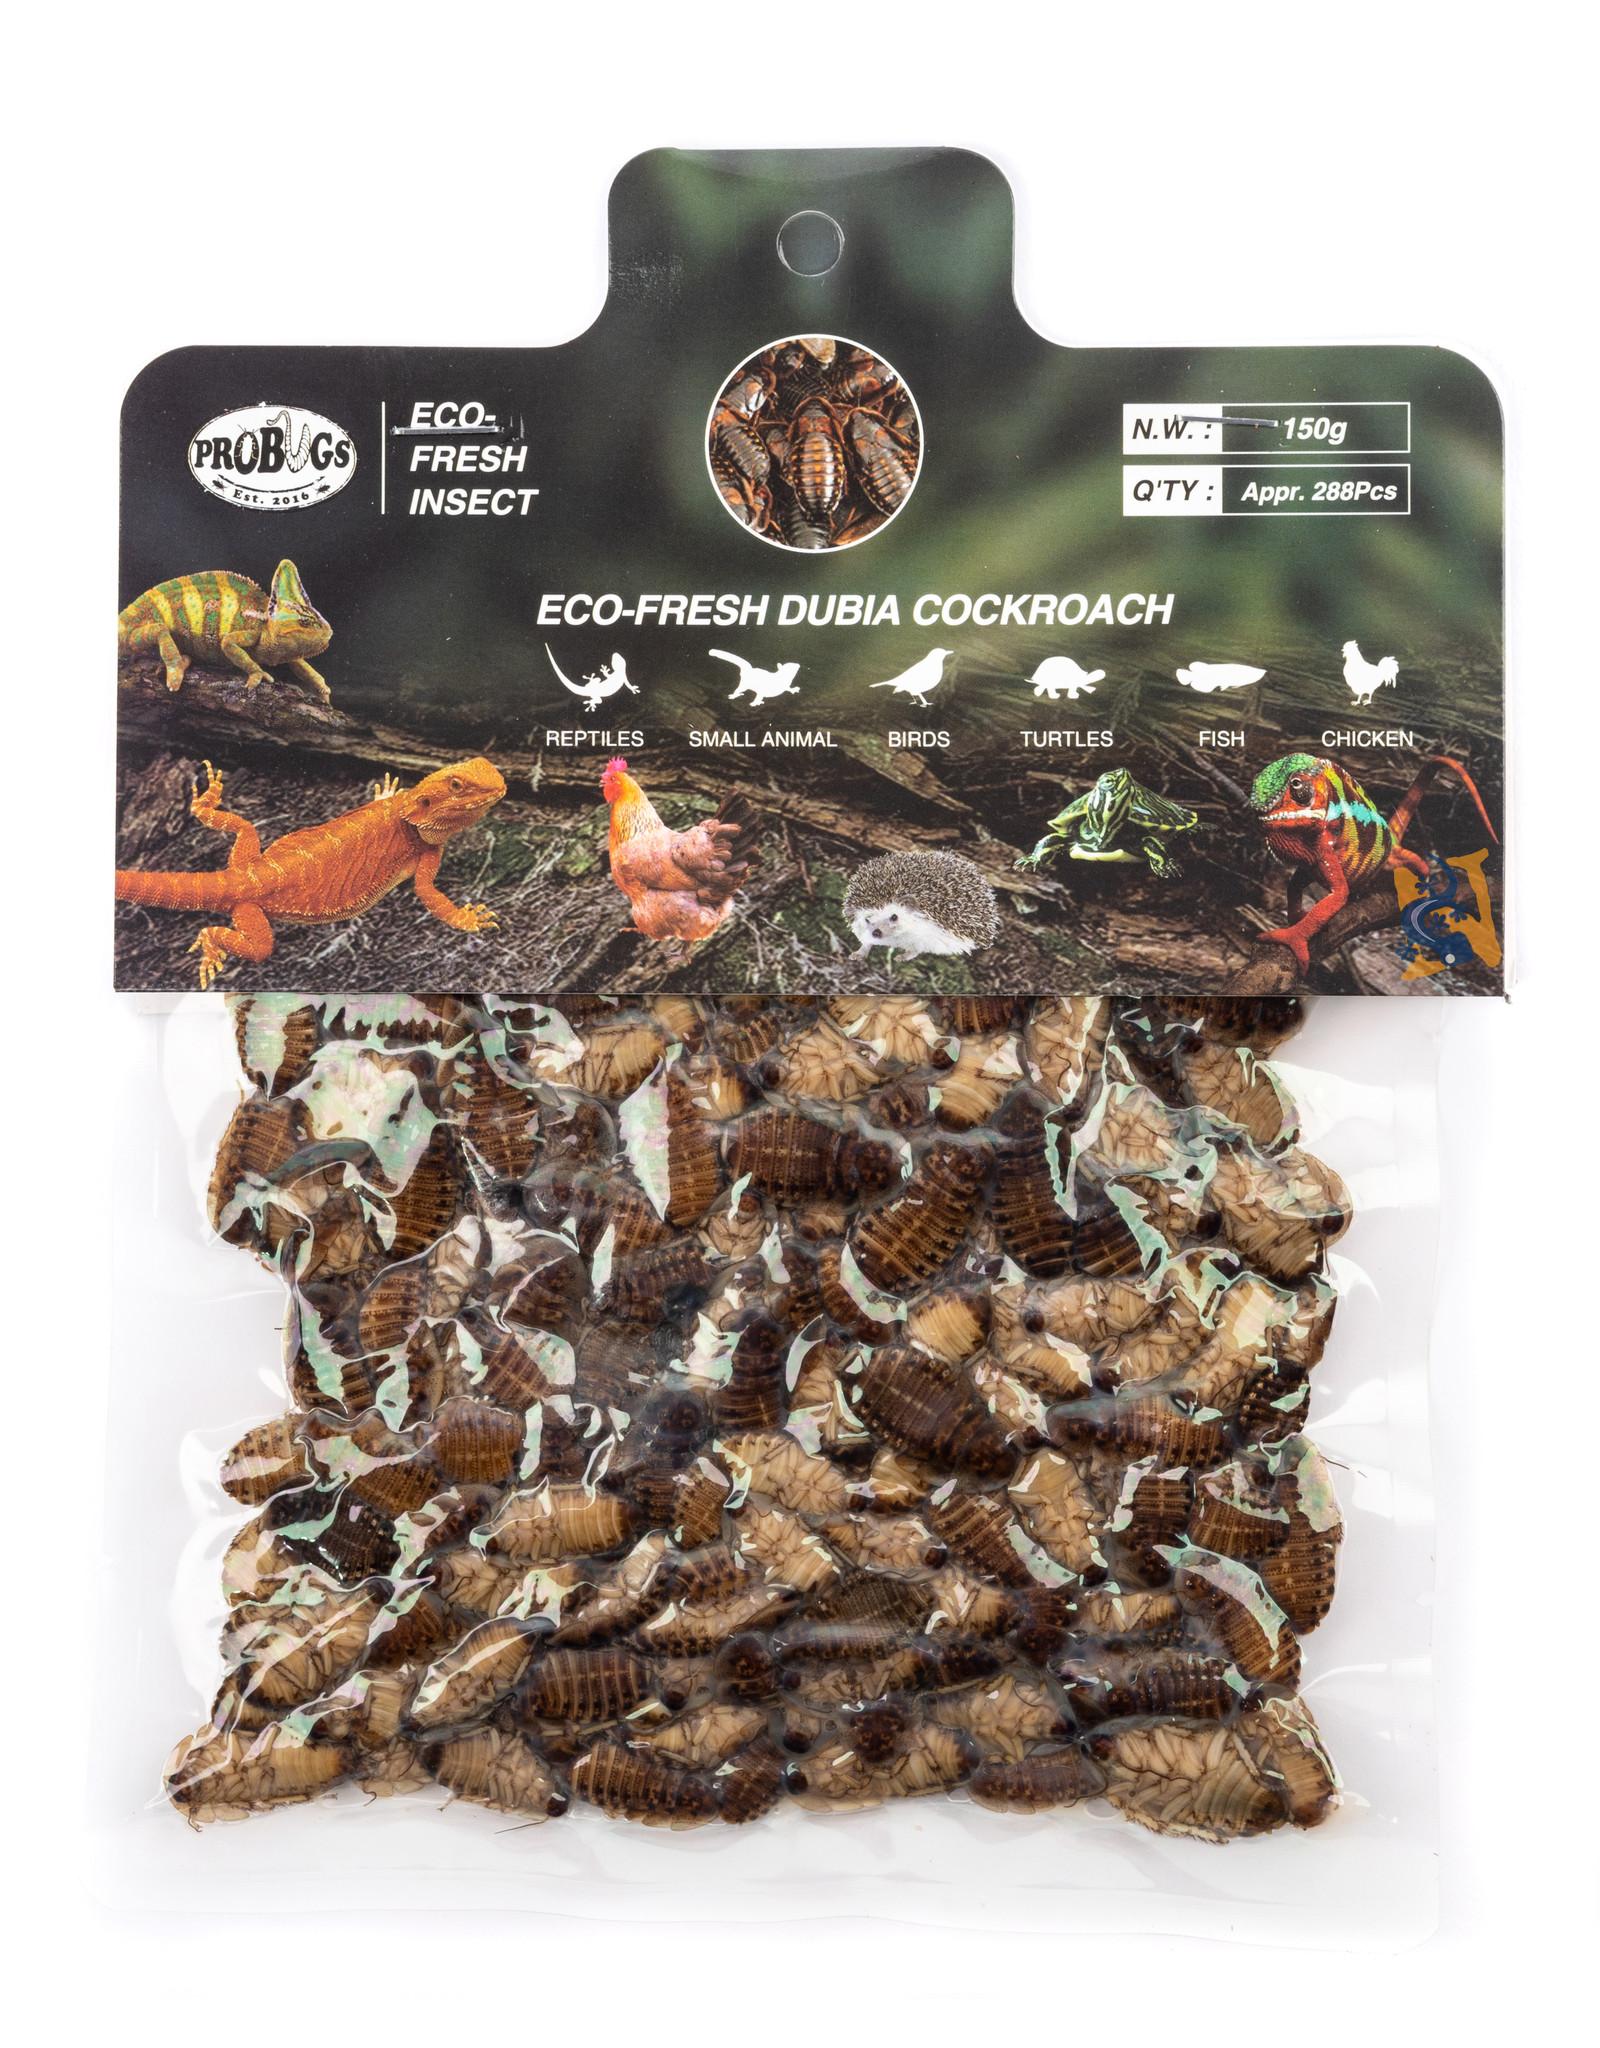 Pro Bugs PRO BUGS Dubia Cockroach Bulk Medium (288pcs)